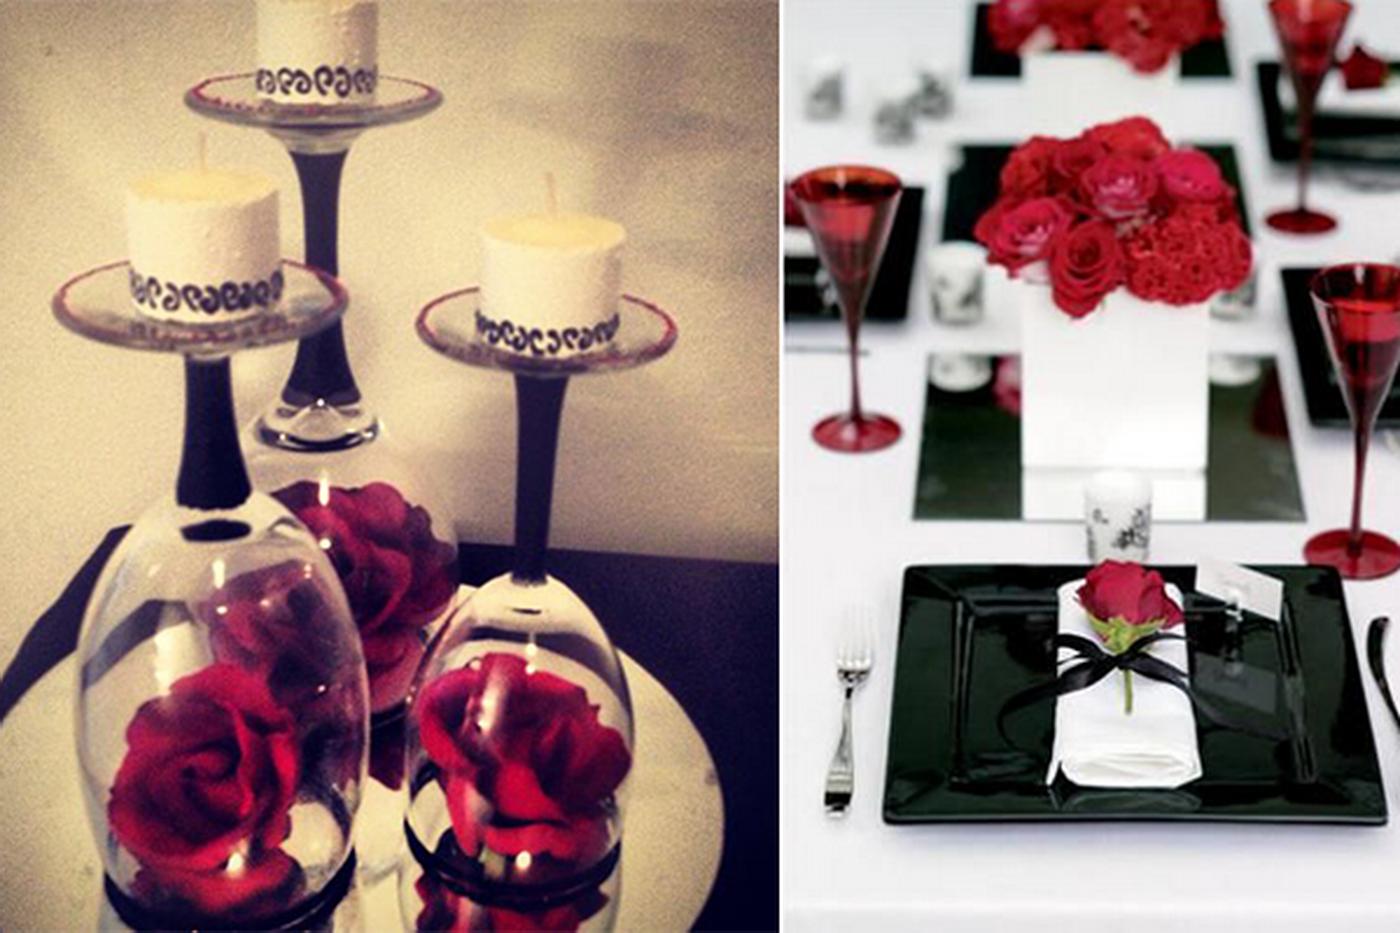 Idei pentru decoratiuni de nunta cu alb, negru si rosu